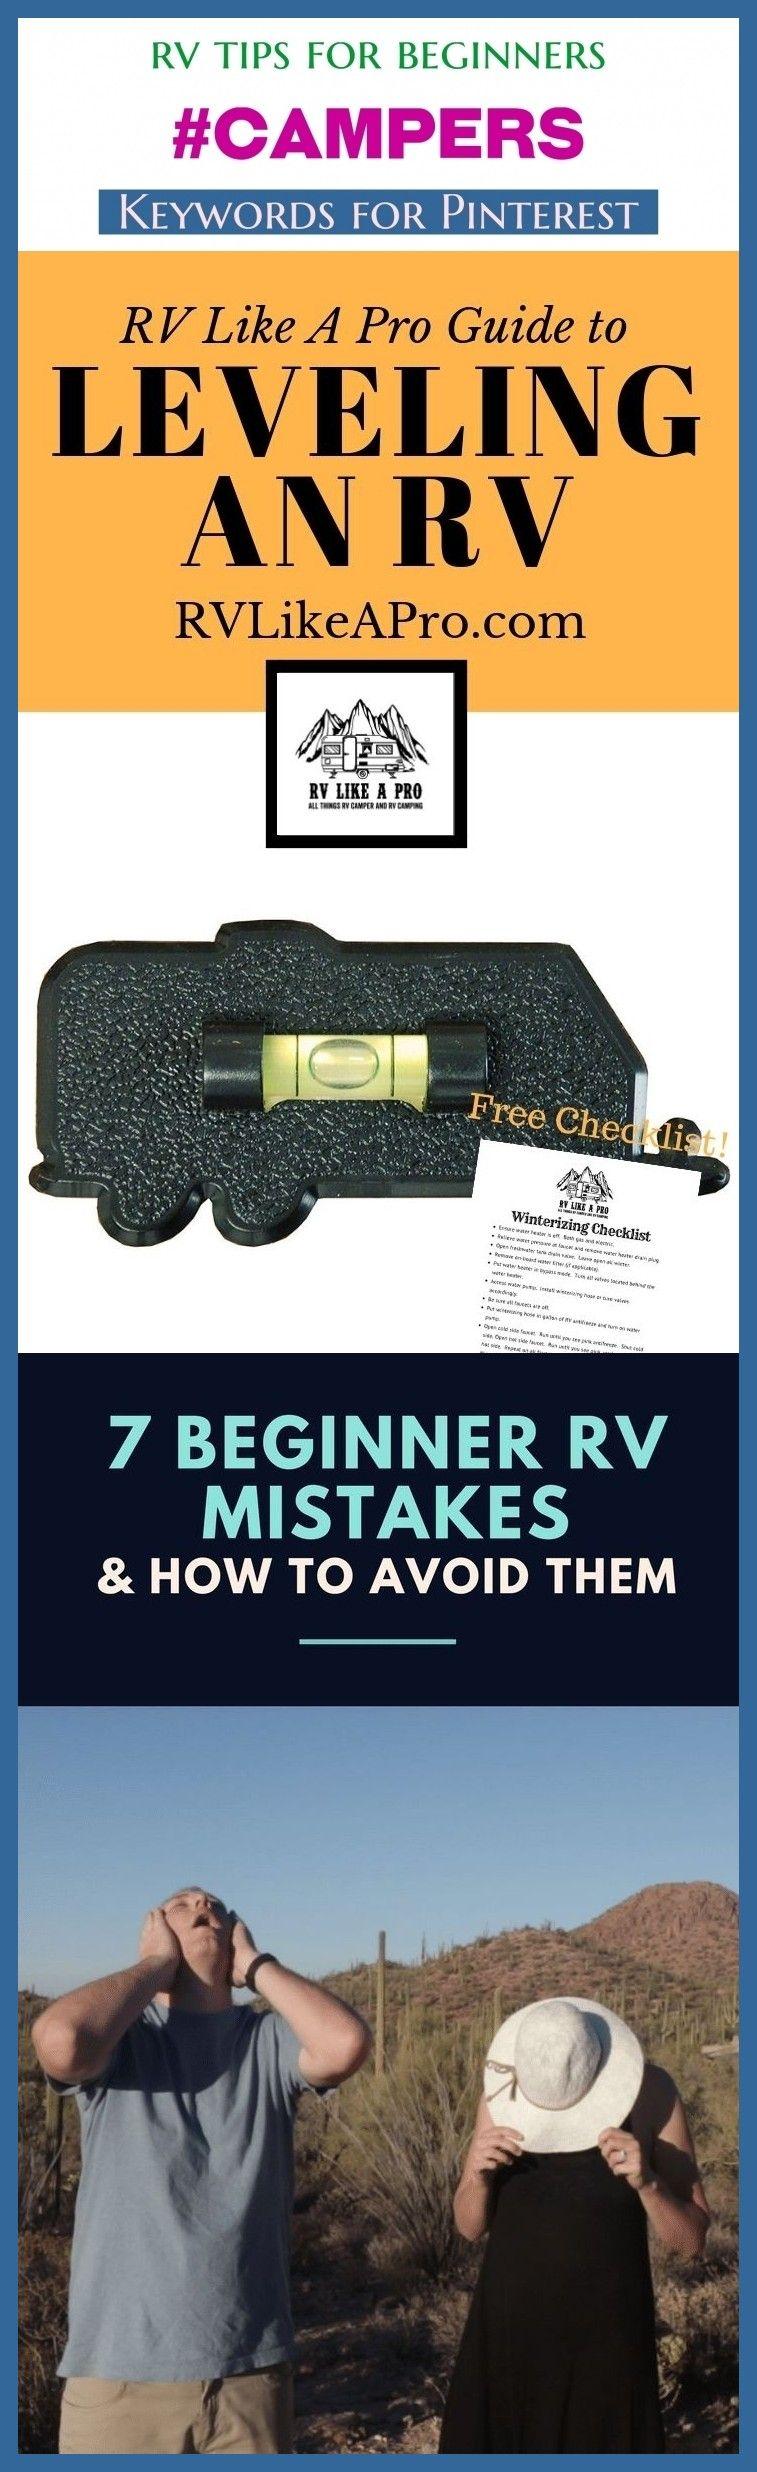 Rv tips for beginners rv tips for beginners, rv tips and tricks, rv tips hacks, rv tips motorhome,